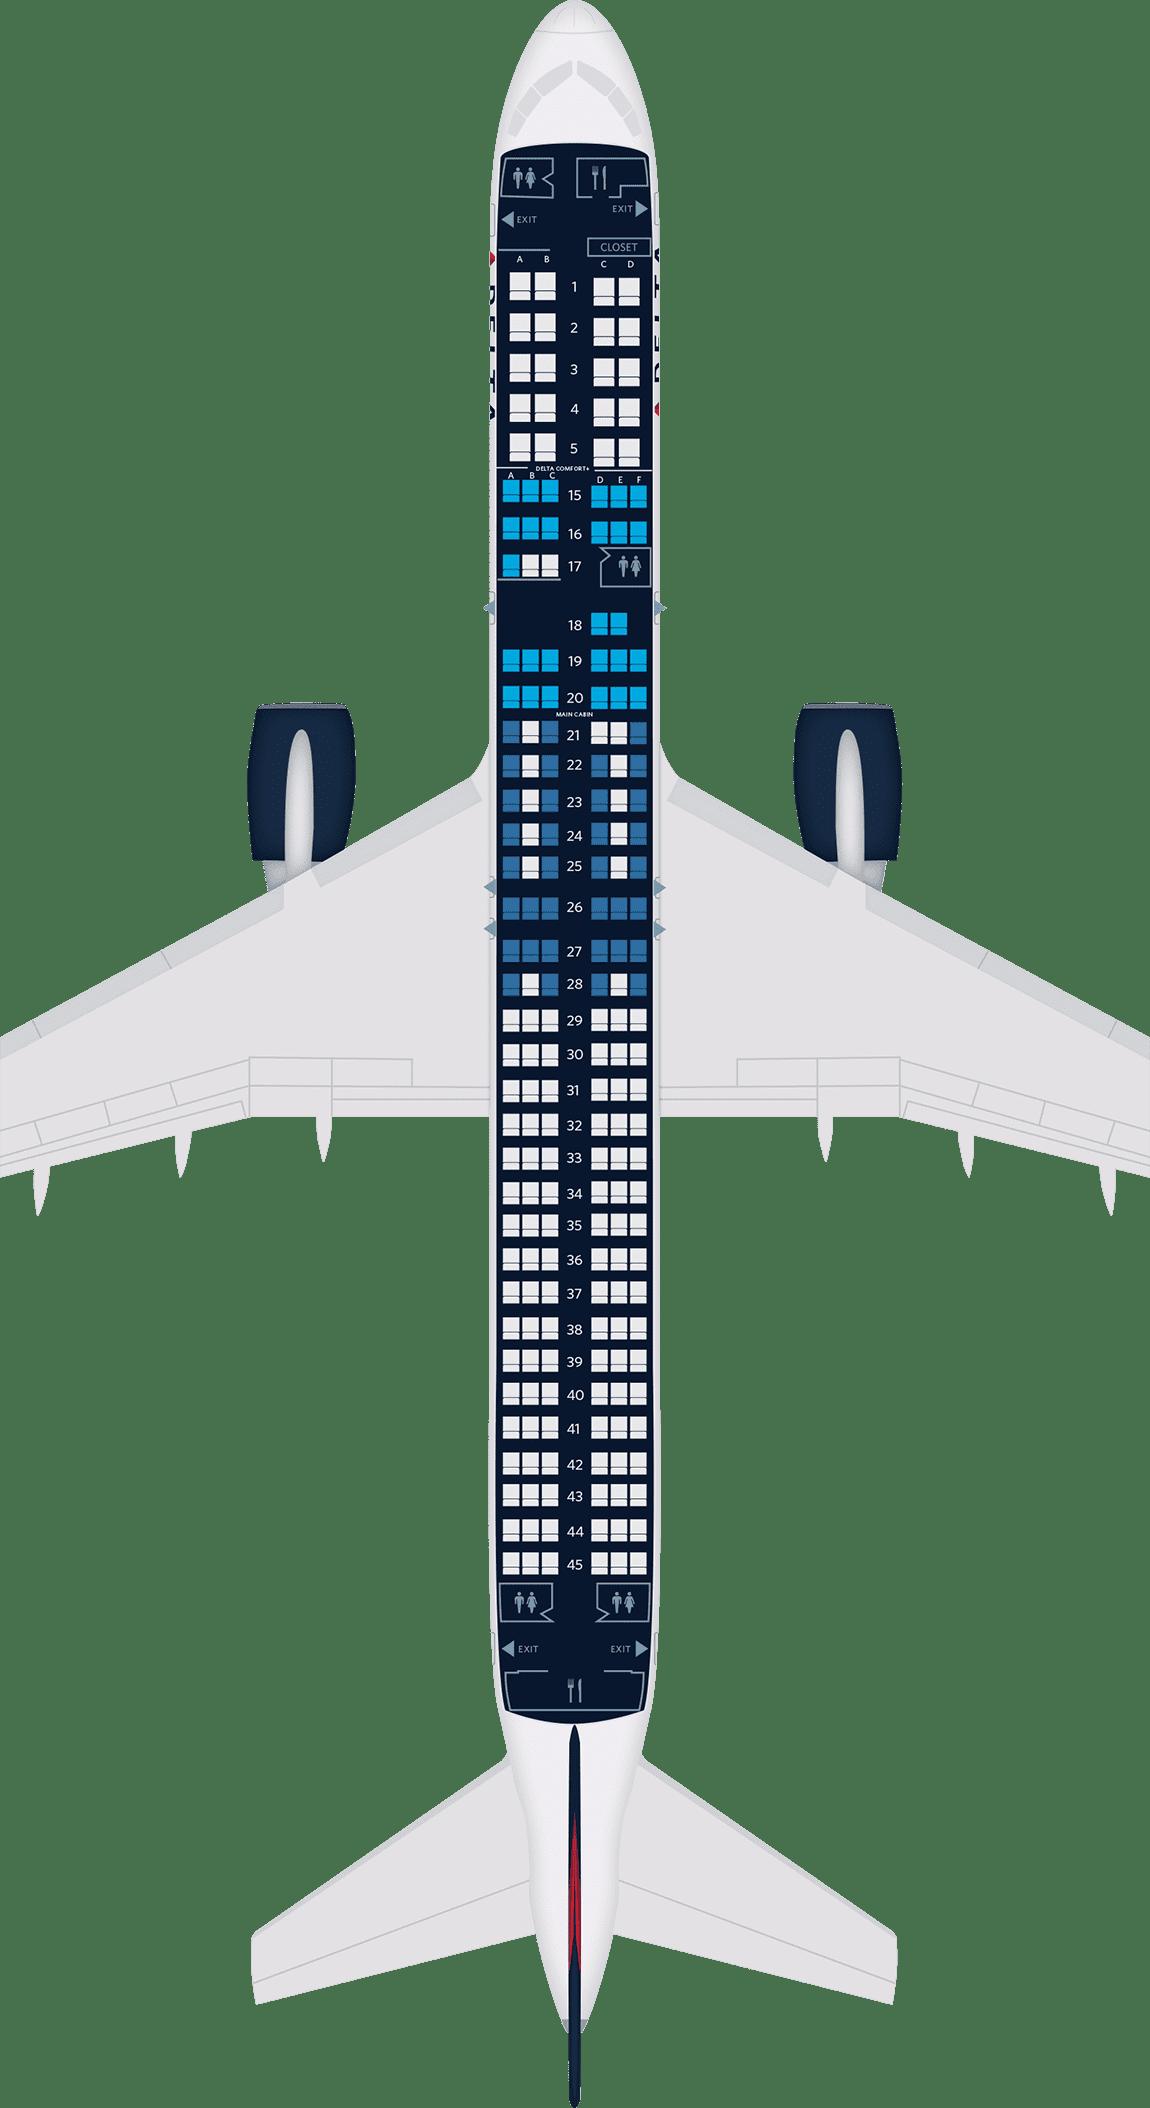 Boeing 757-200 Aircraft Seat Maps, Specs & Amenities : Delta